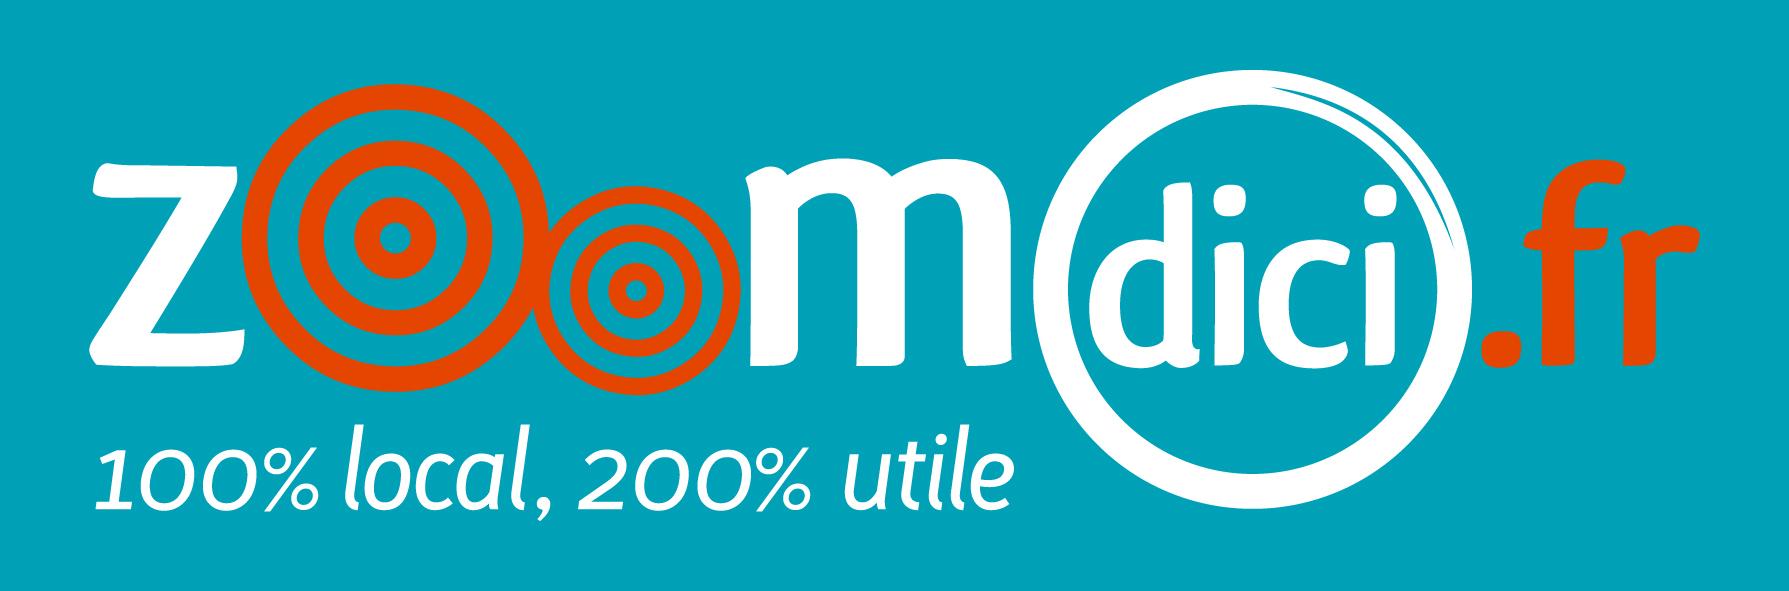 logo_zoomdici_fond_bleu